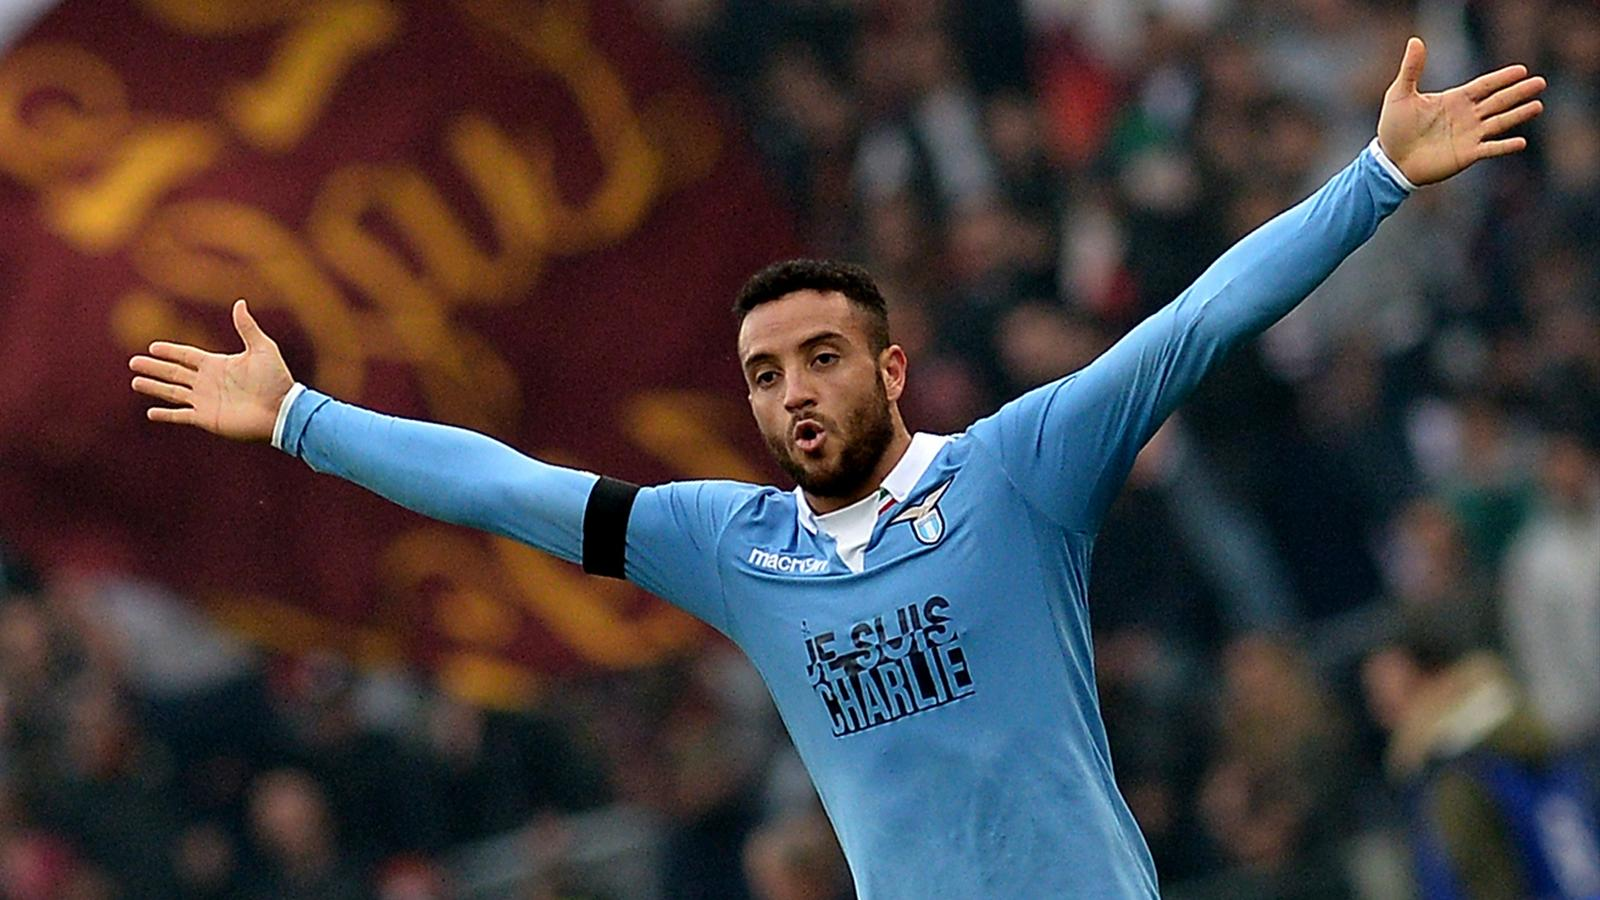 Francesco Totti heroics rescue Roma after Lazio's storming ... Felipe Anderson